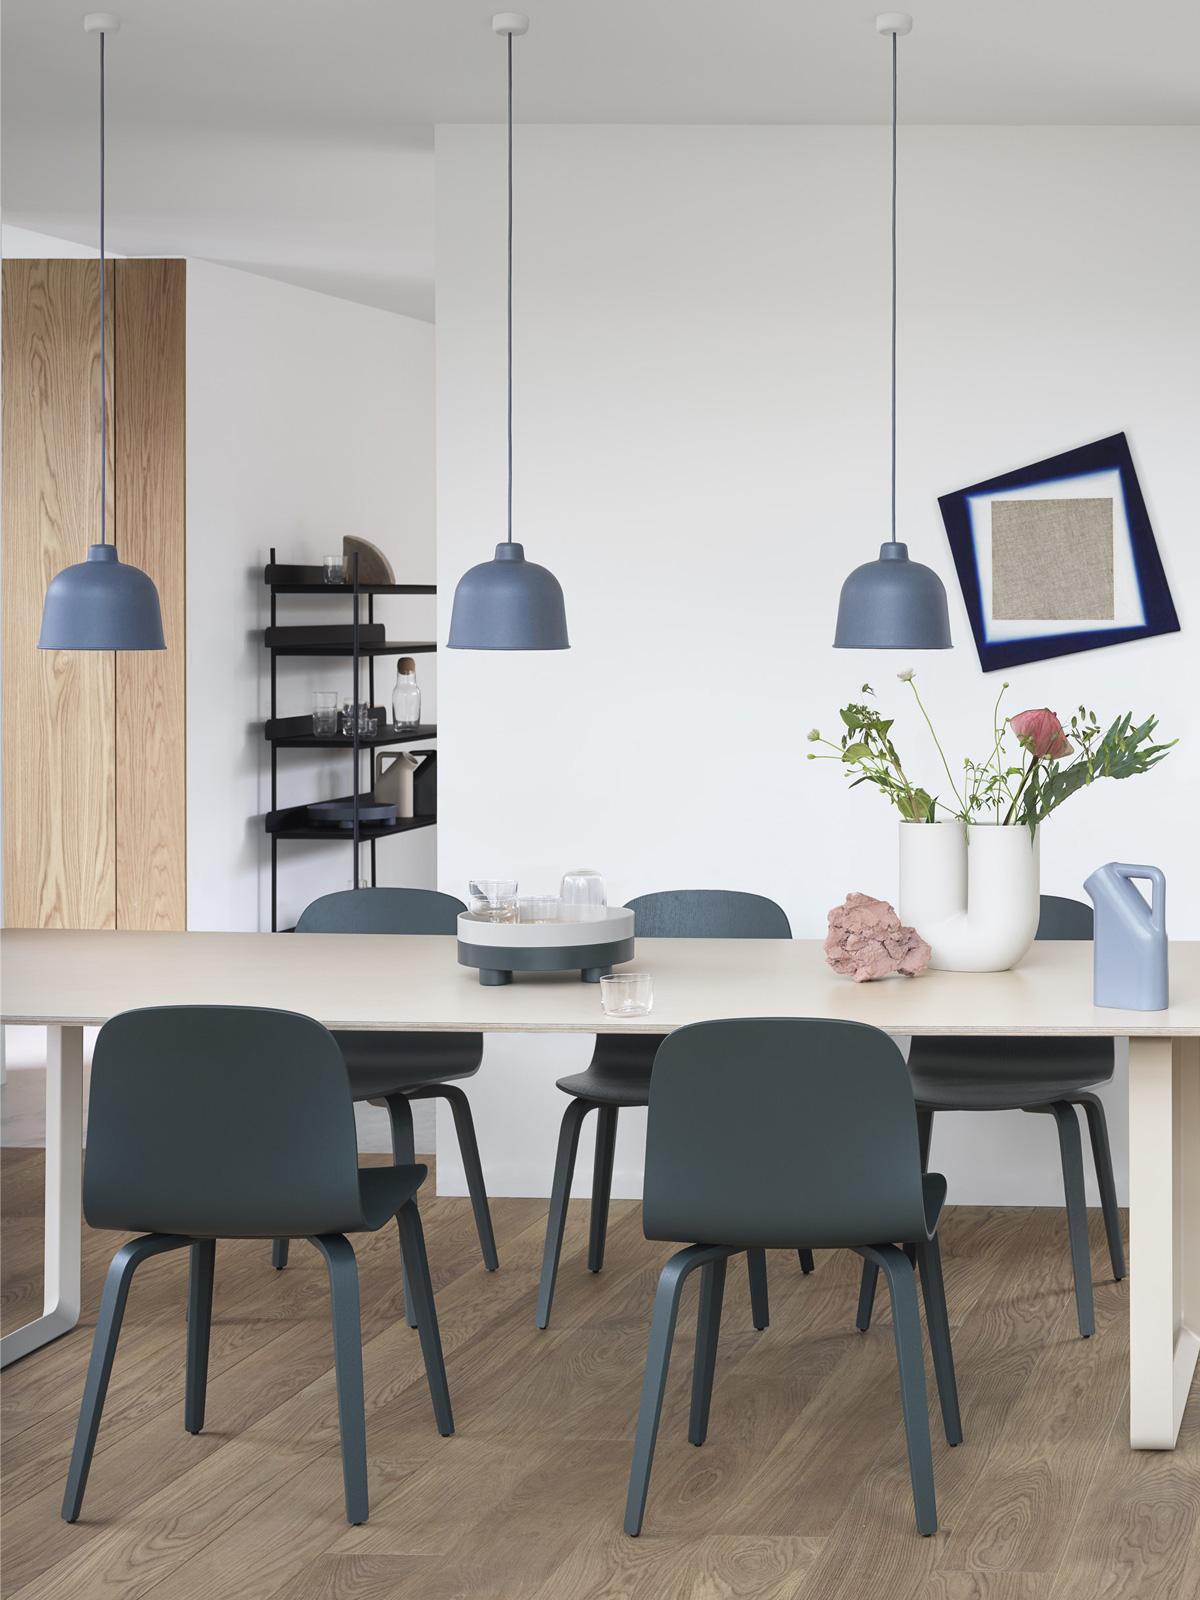 Grain nachhaltige Leuchten skandinavisch muuto DesignOrt Lampen Berlin